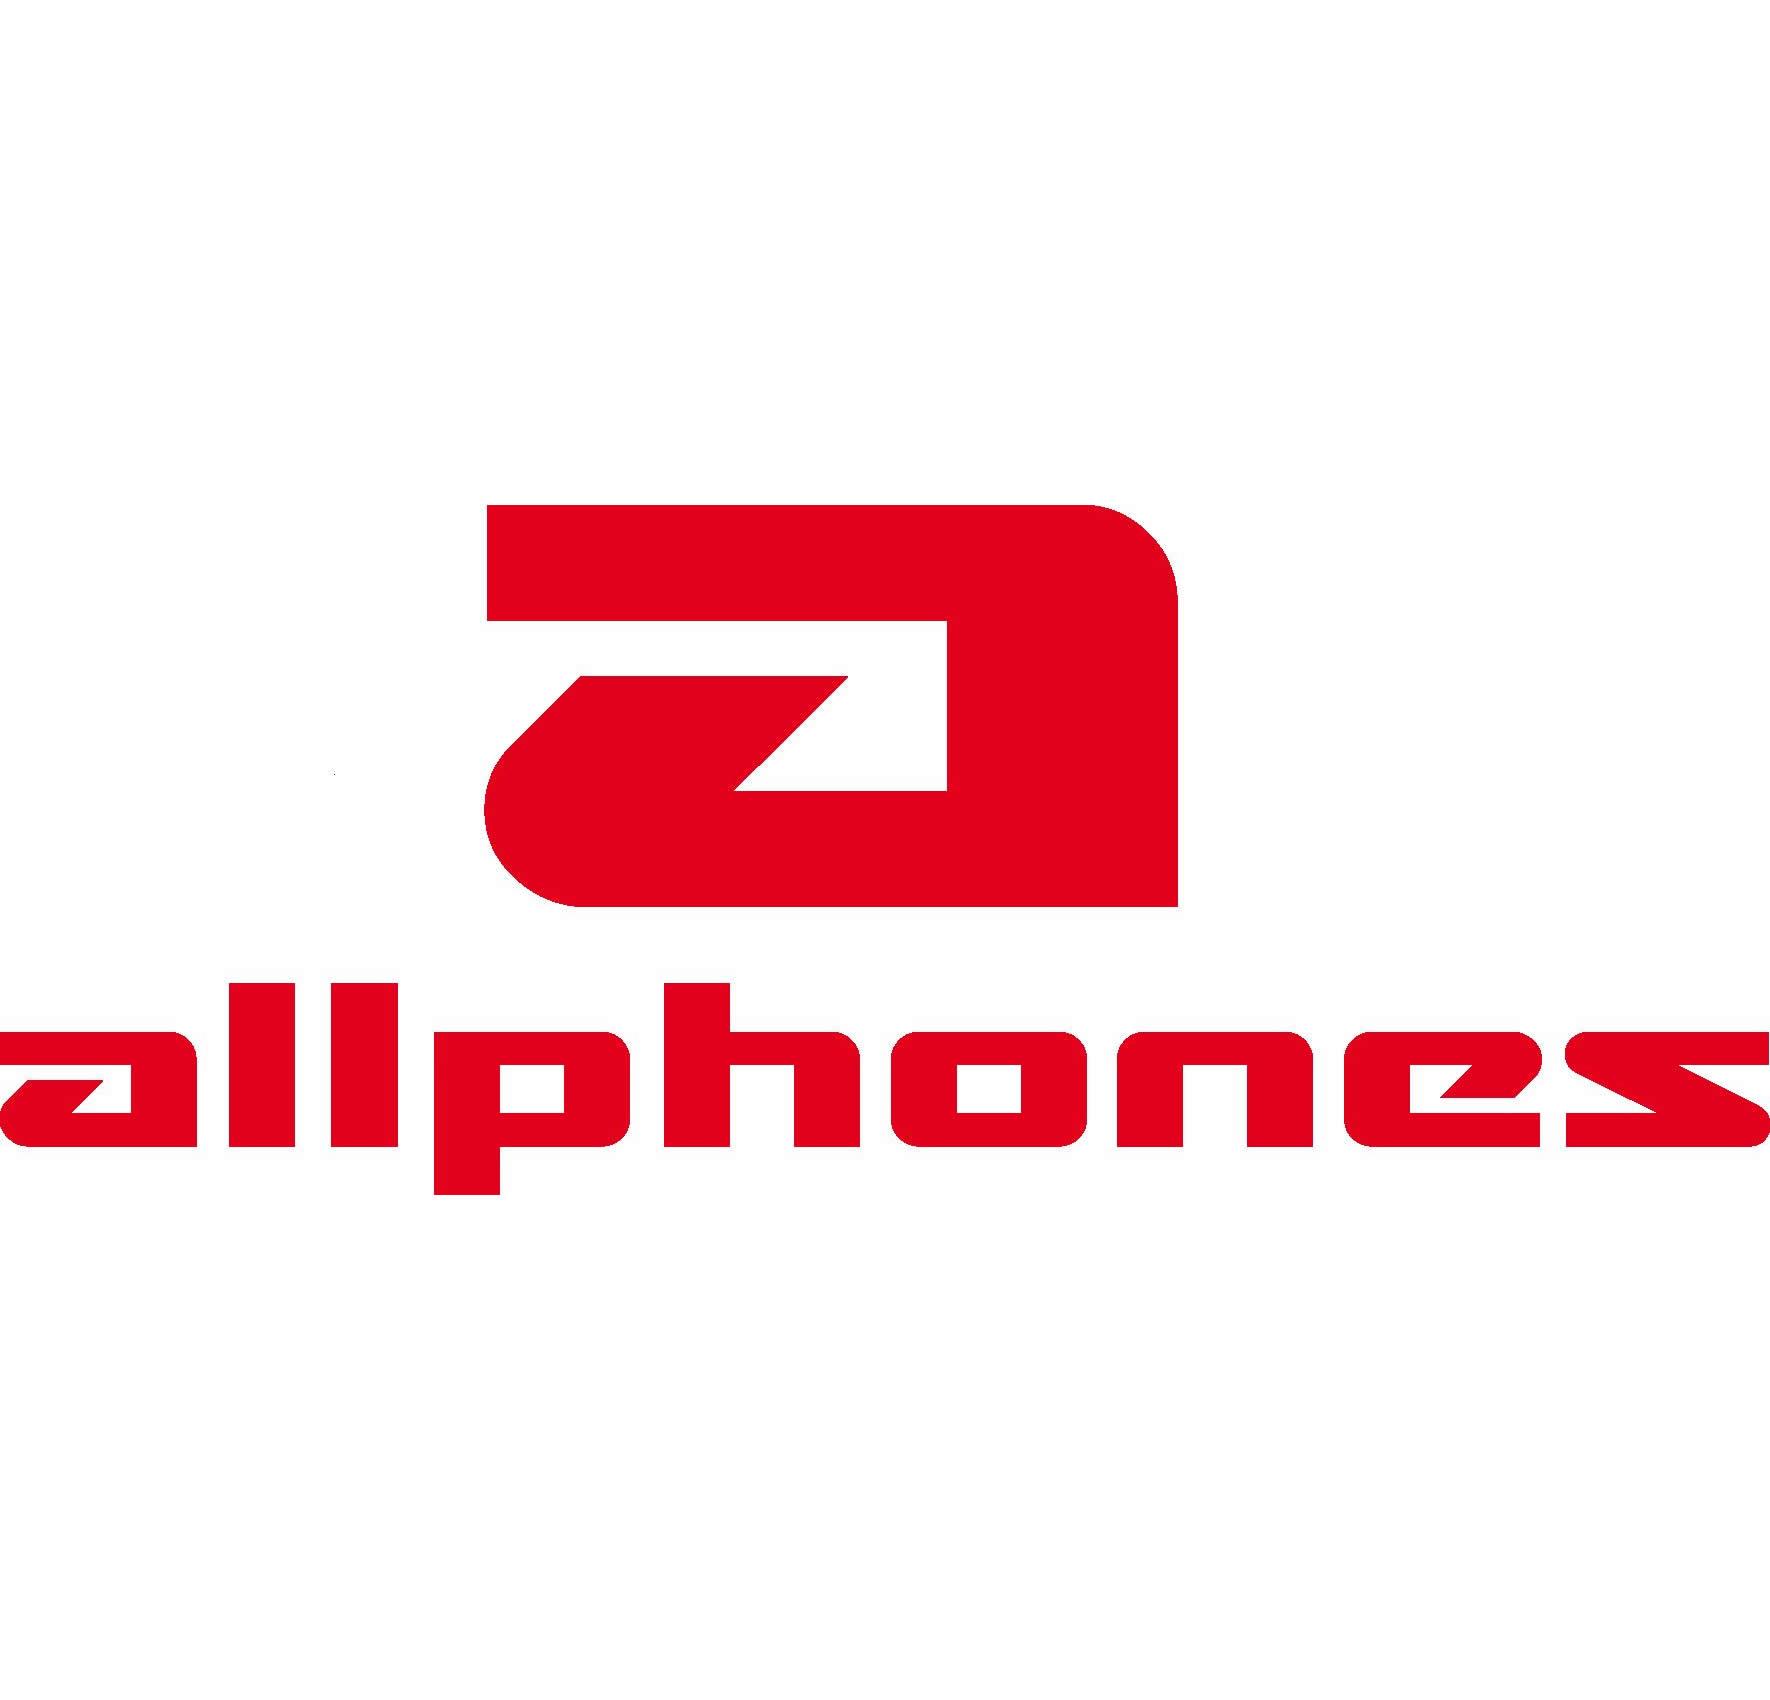 Allphones-logo-1700x1700